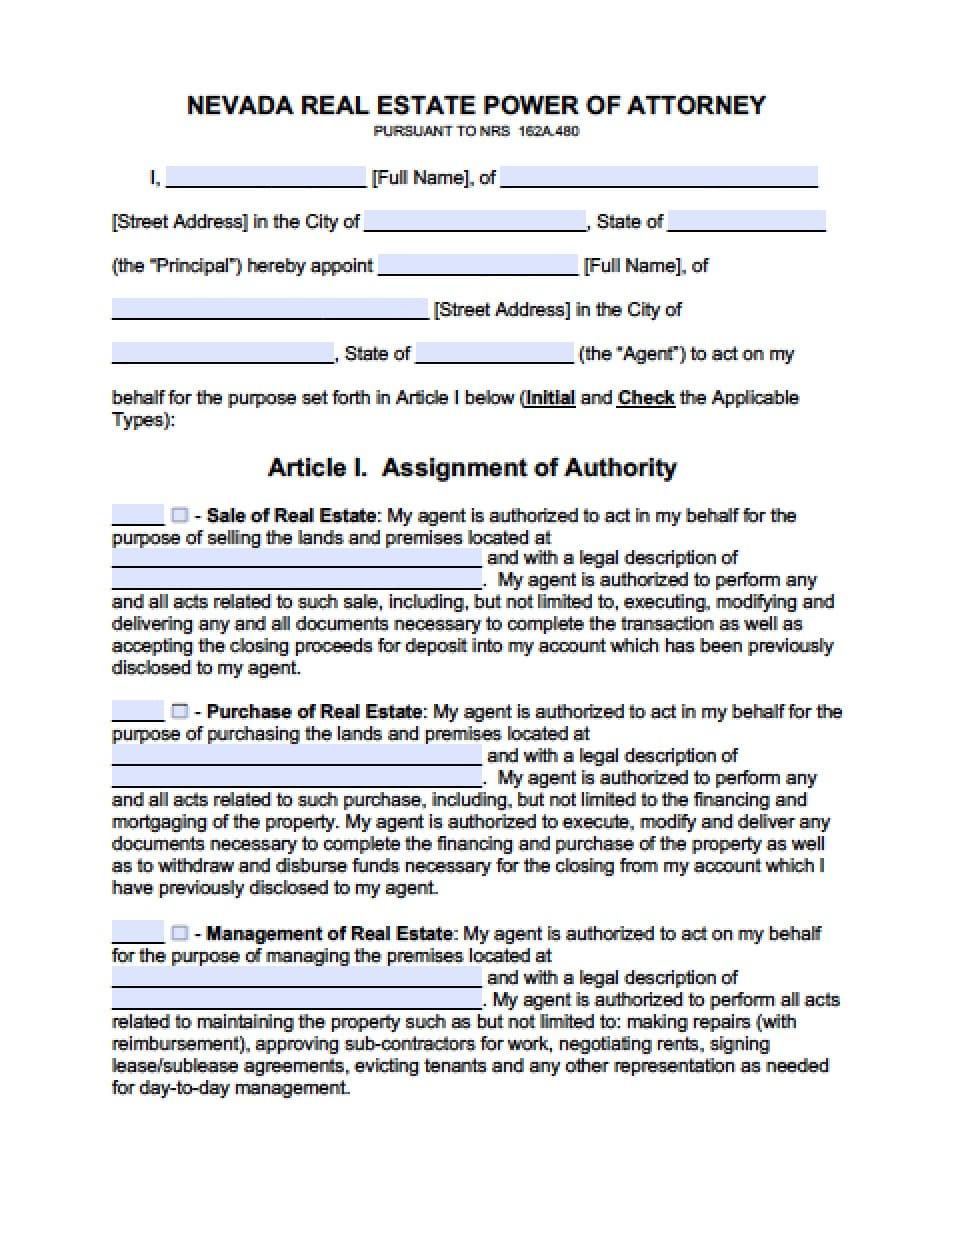 Nevada Minor Child Power of Attorney Form Power of Attorney – Power of Attorney Form